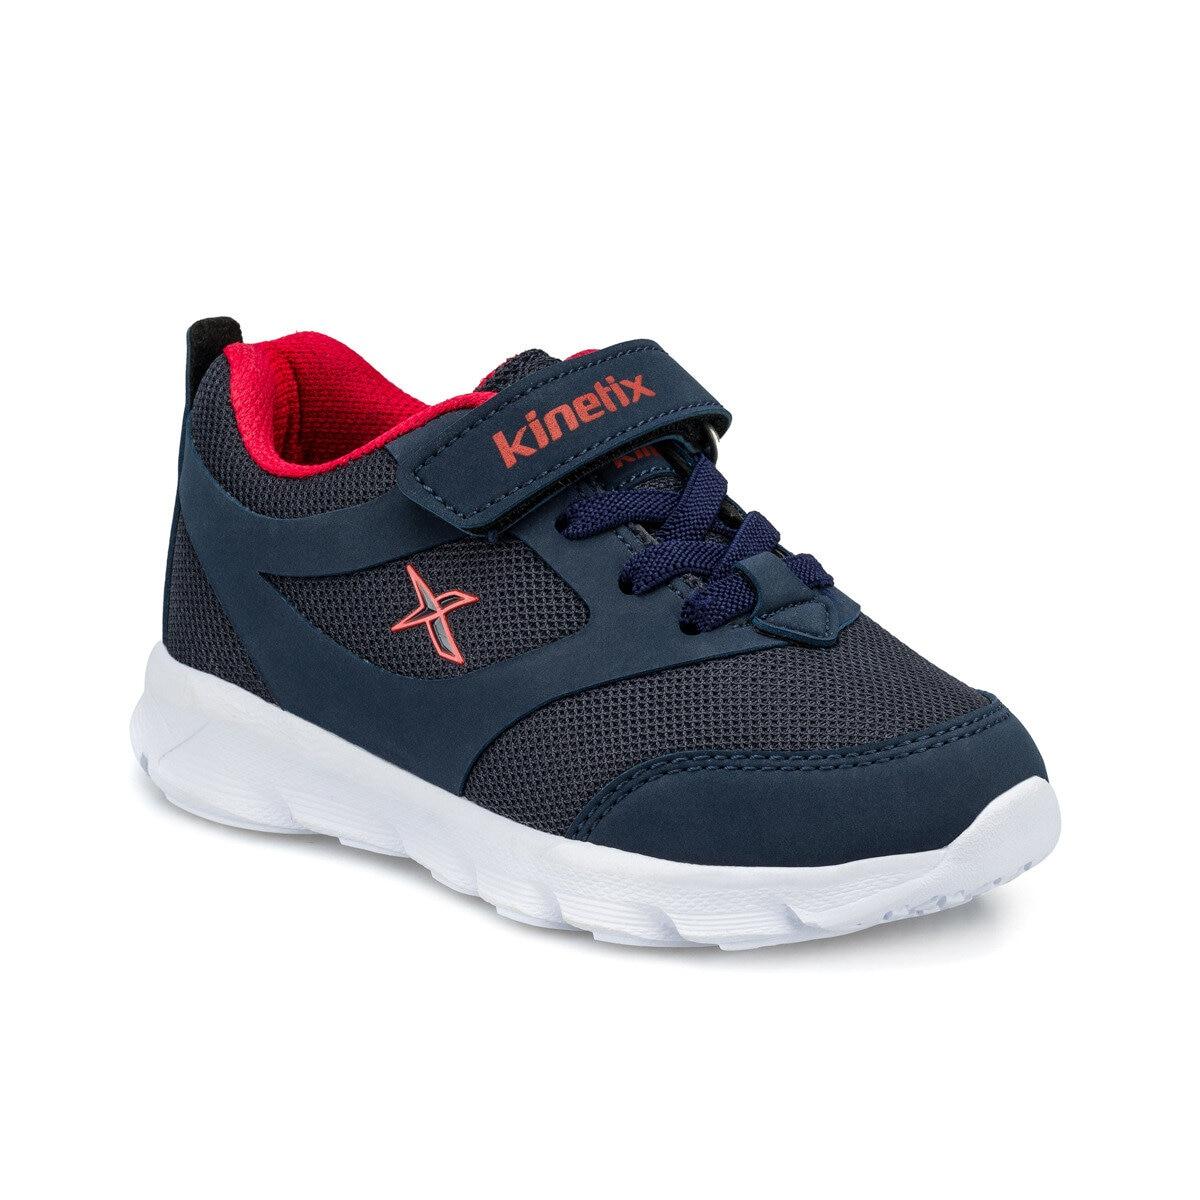 FLO ALMERA J Navy Blue Male Child Hiking Shoes KINETIX